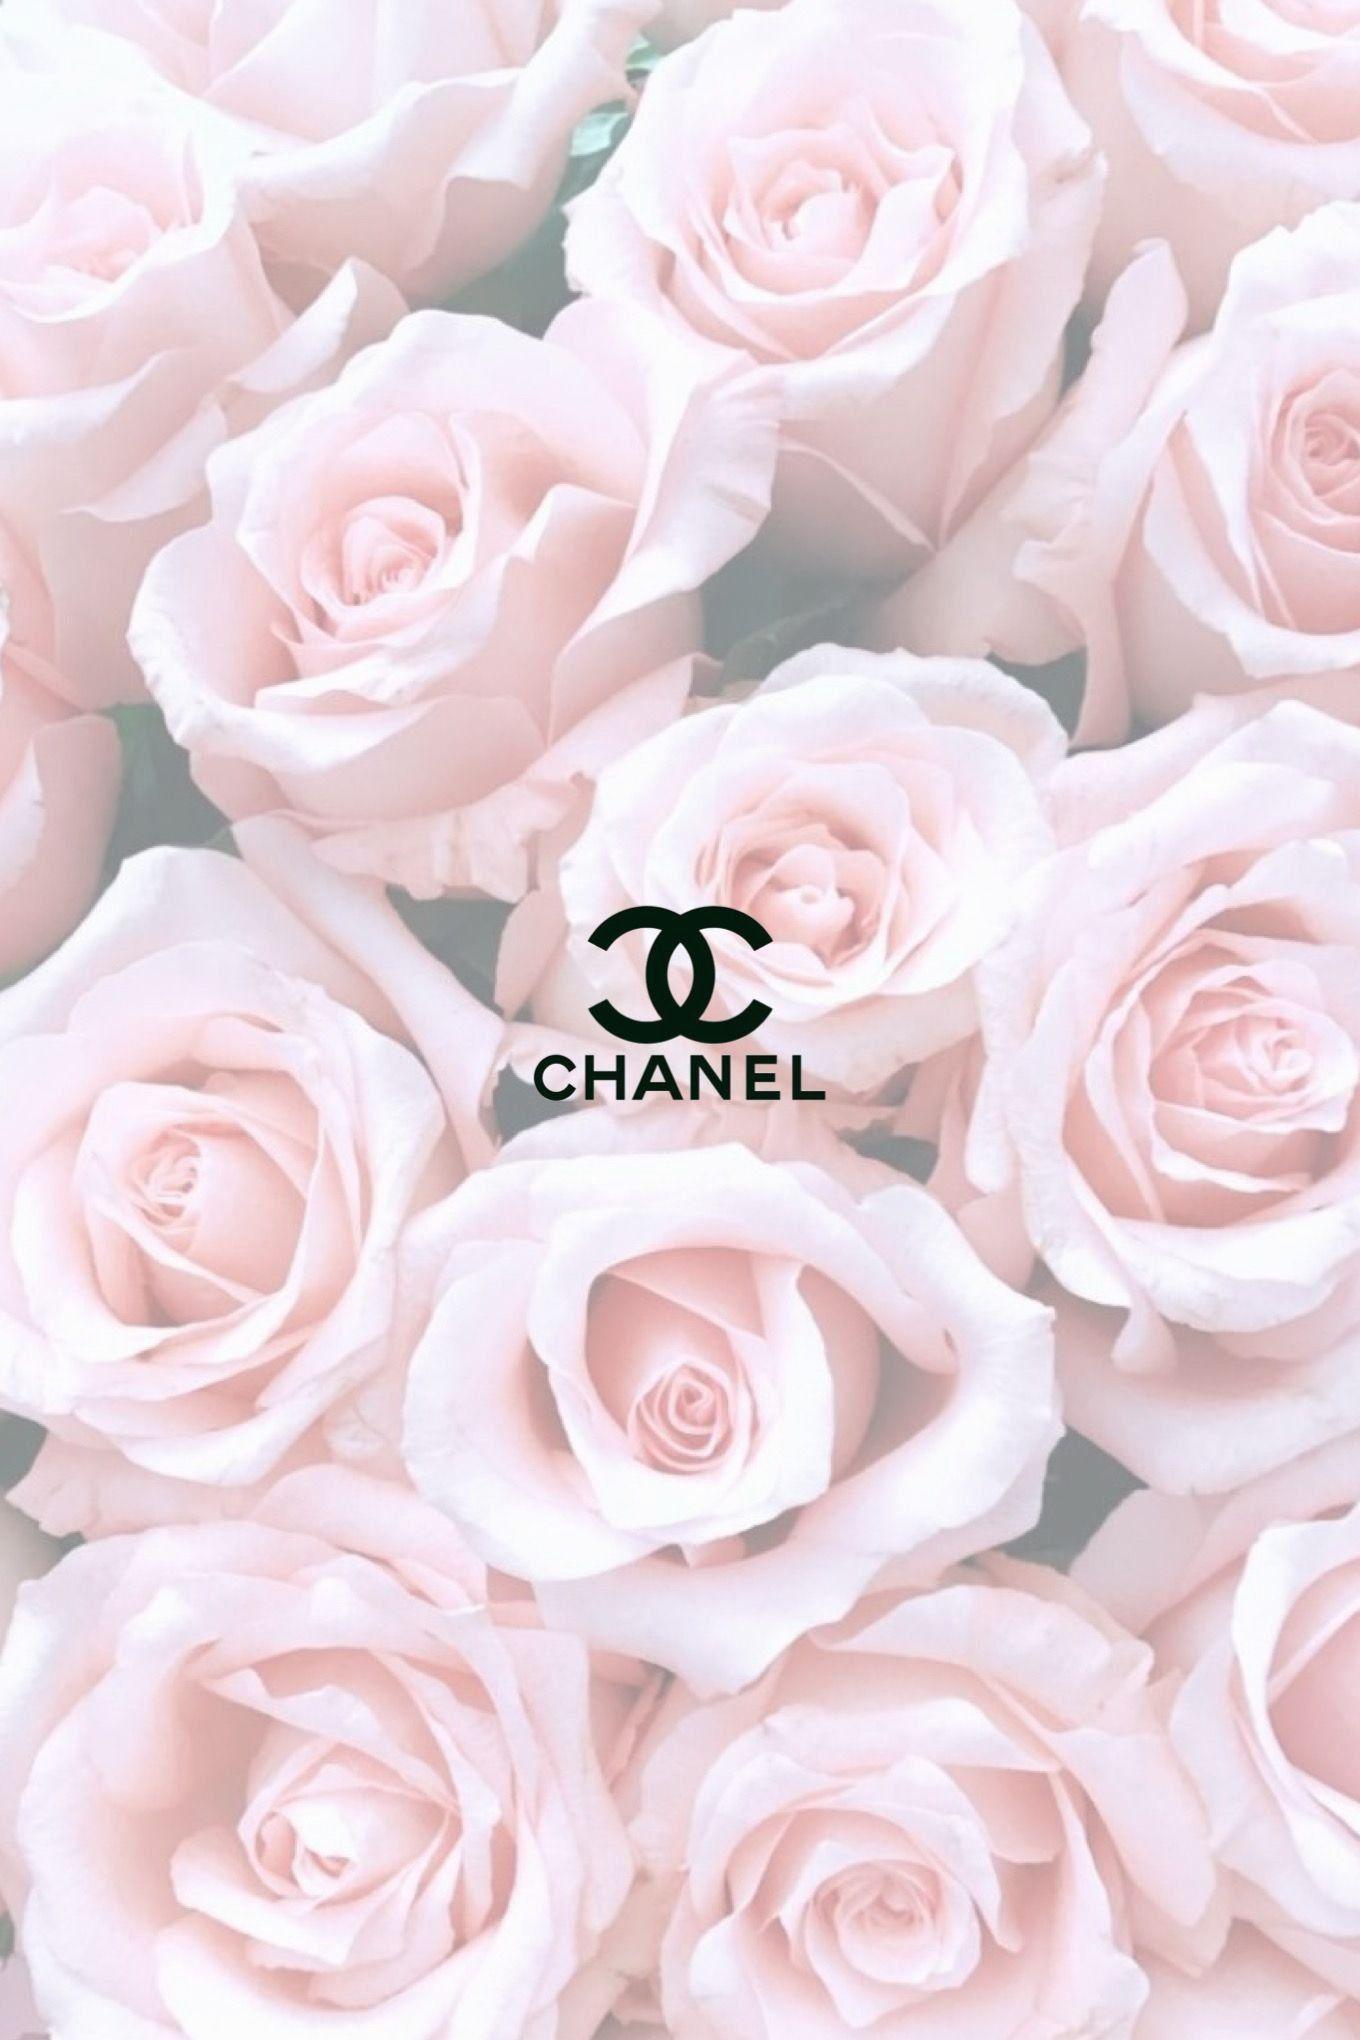 Chanel Aesthetic Rose Wallpaper 1000 Pink Wallpaper Girly Aesthetic Roses Phone Wallpaper Pink